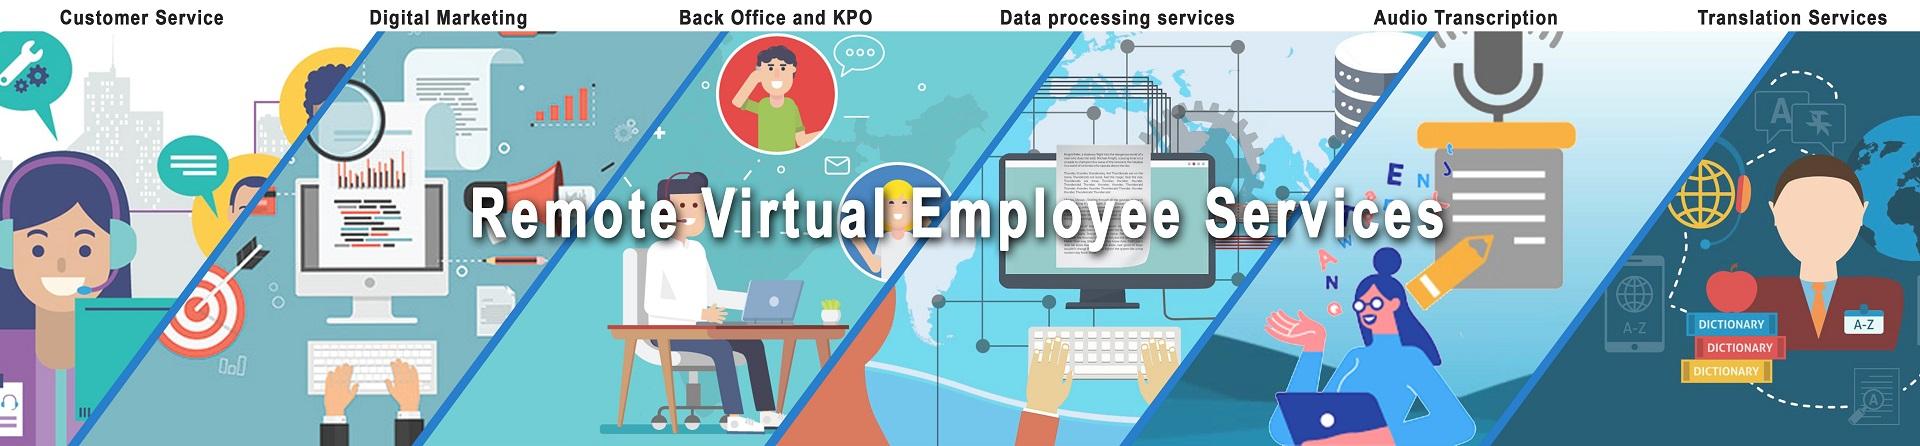 Remote Virtual Employee Services